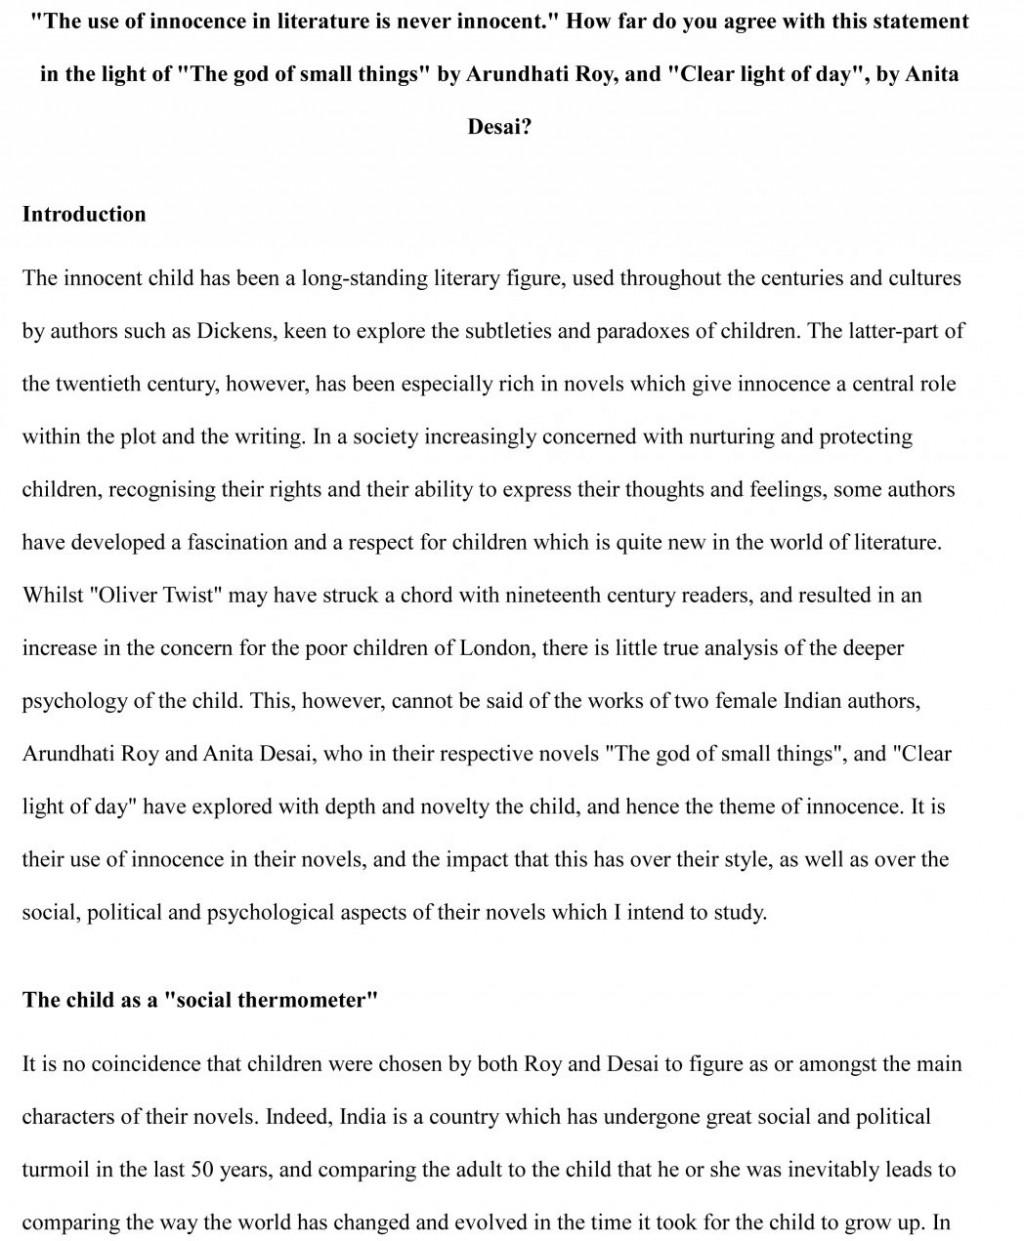 008 Essay Example Poetry Essays Poem On Poems Doit Ip Comparative Alevel Course Work S Paper Comparison Analysis Pdf Introduction Gcse Level Explication Unbelievable Sample Large